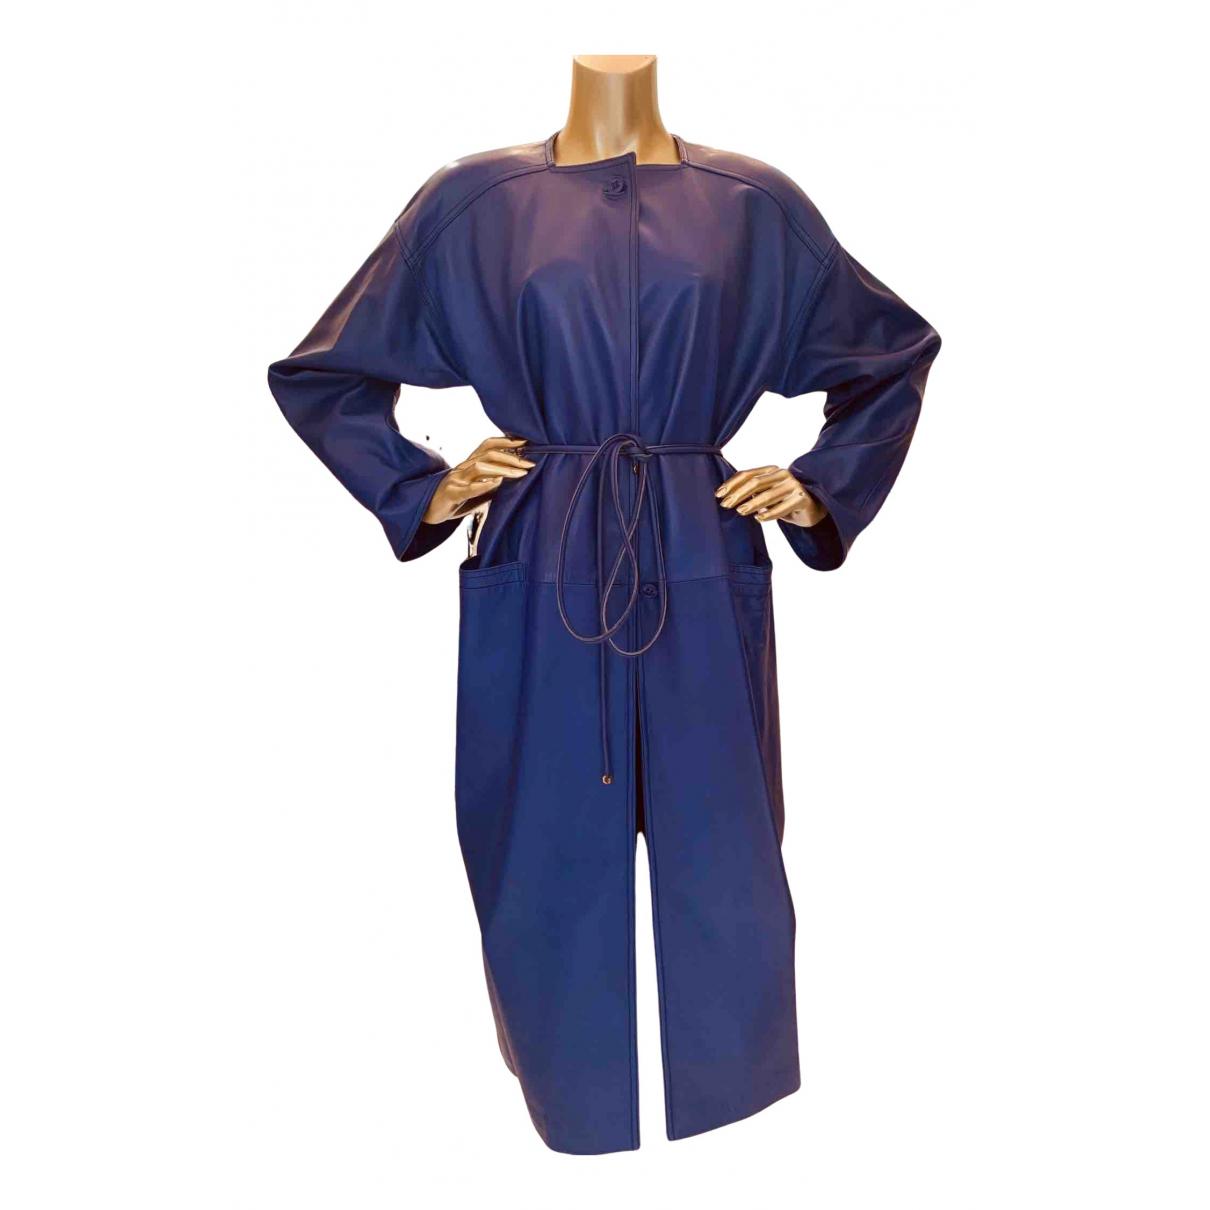 Loewe N Blue Leather coat for Women 12 UK